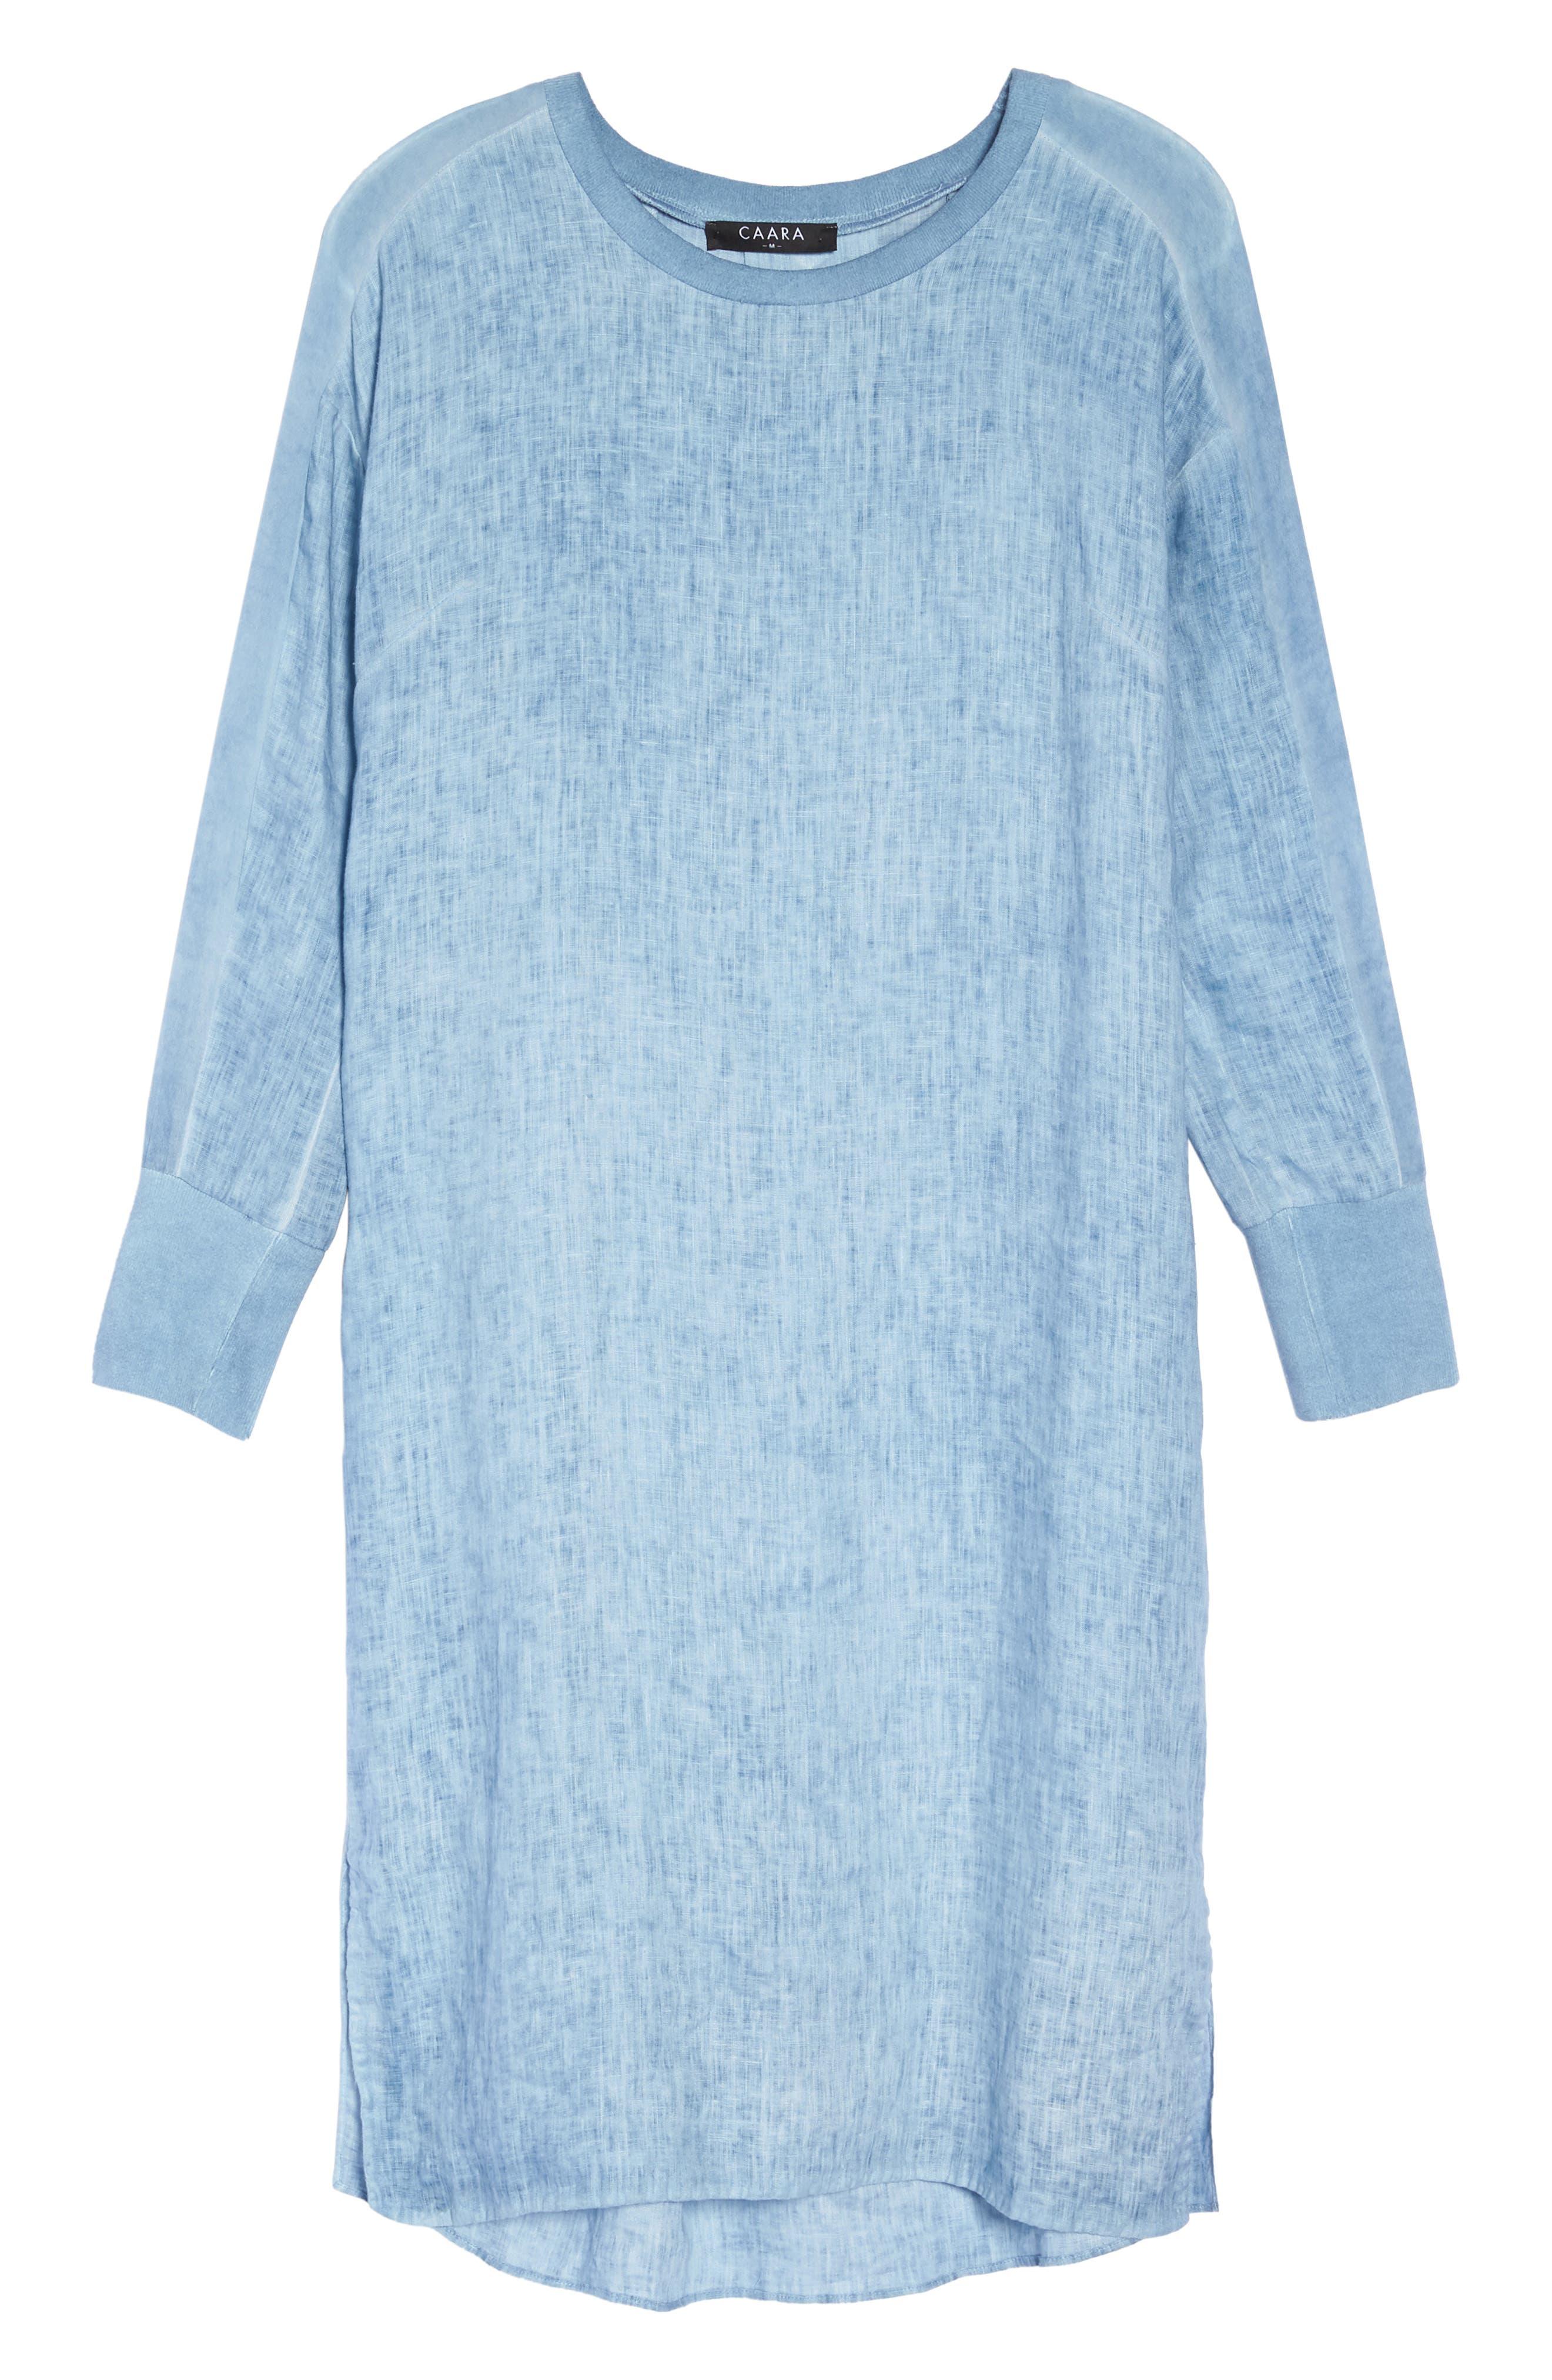 Rata Linen Shift Dress,                             Alternate thumbnail 7, color,                             Blue